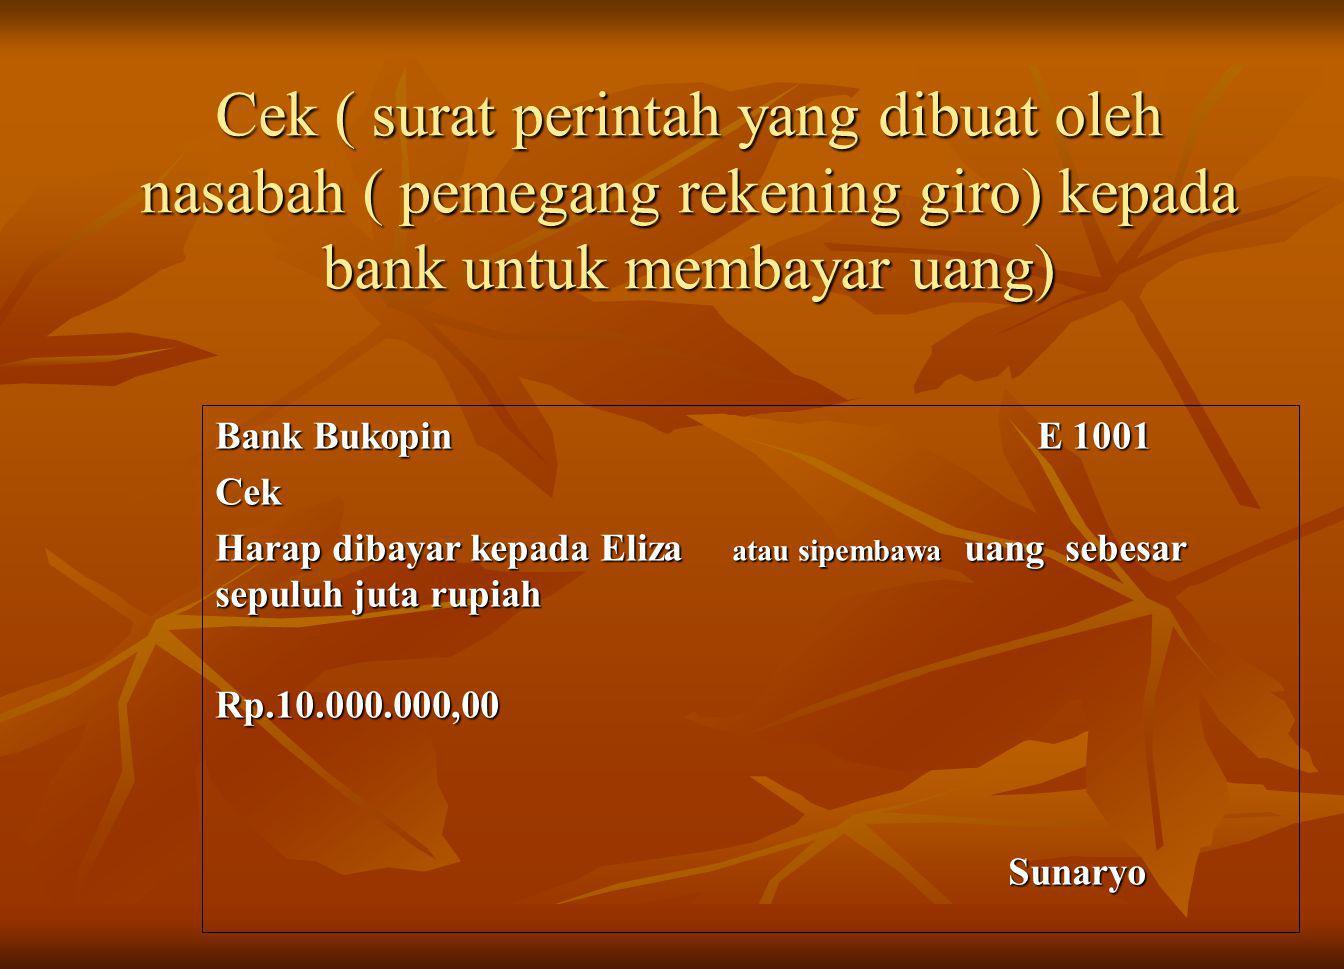 Cek ( surat perintah yang dibuat oleh nasabah ( pemegang rekening giro) kepada bank untuk membayar uang) Bank Bukopin E 1001 Cek Harap dibayar kepada Eliza atau sipembawa uang sebesar sepuluh juta rupiah Rp.10.000.000,00 Sunaryo